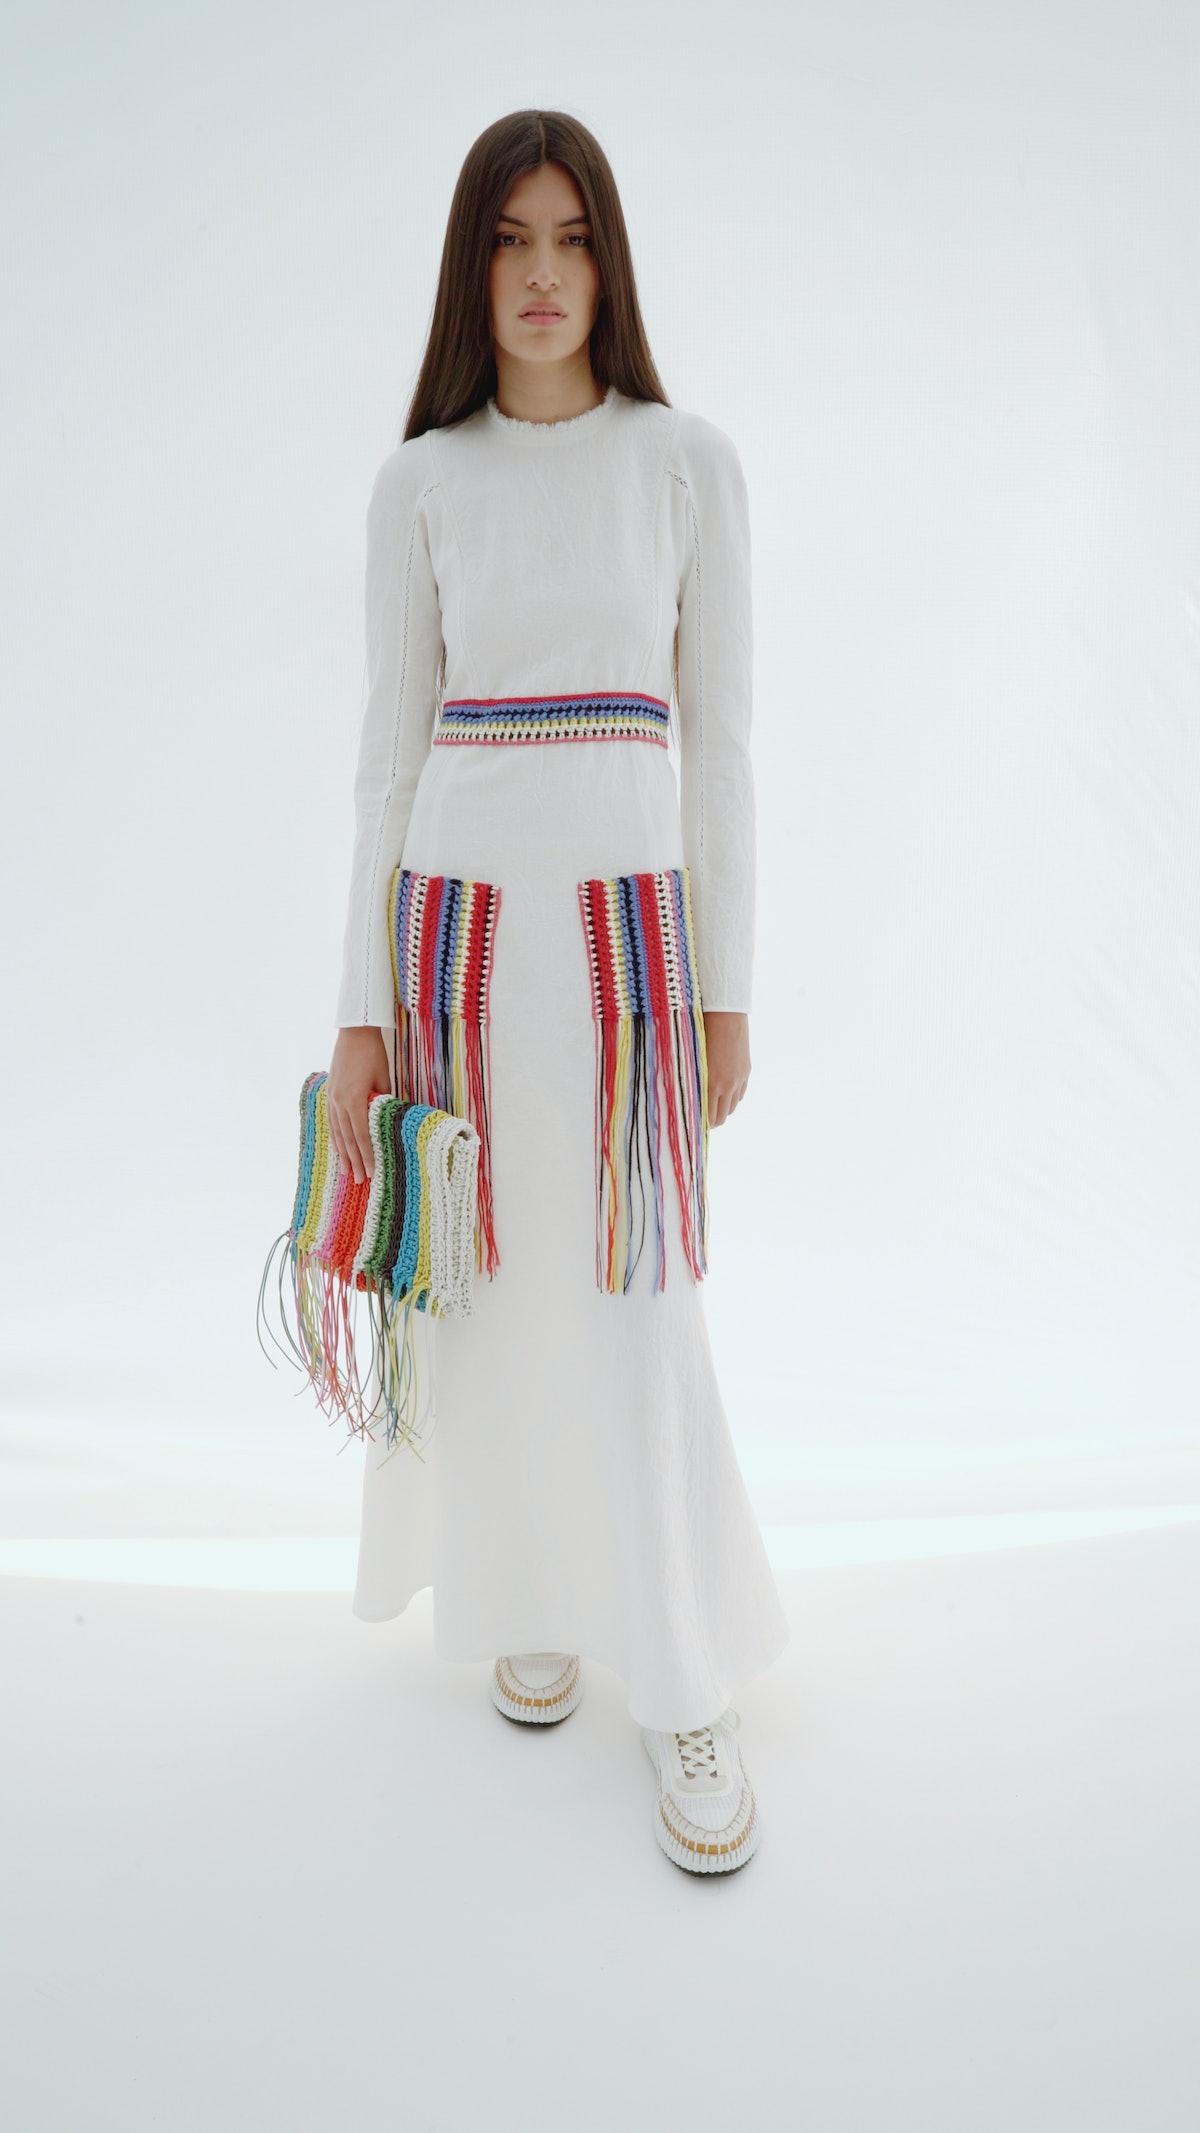 model in chloé knit dress